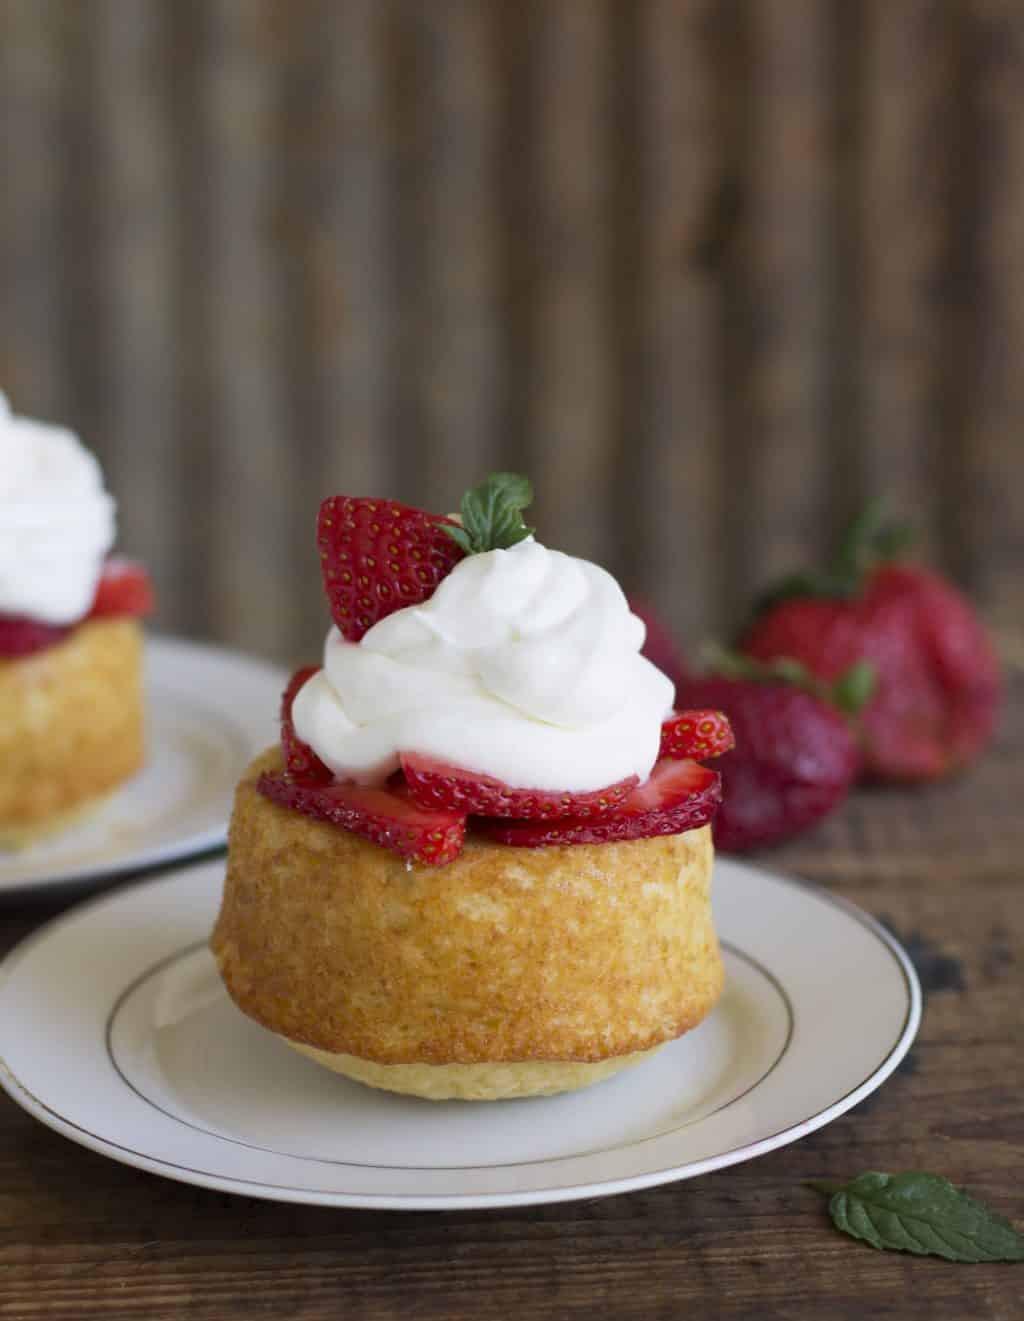 Recipe For Strawberry Shortcake  Homemade Strawberry Shortcake